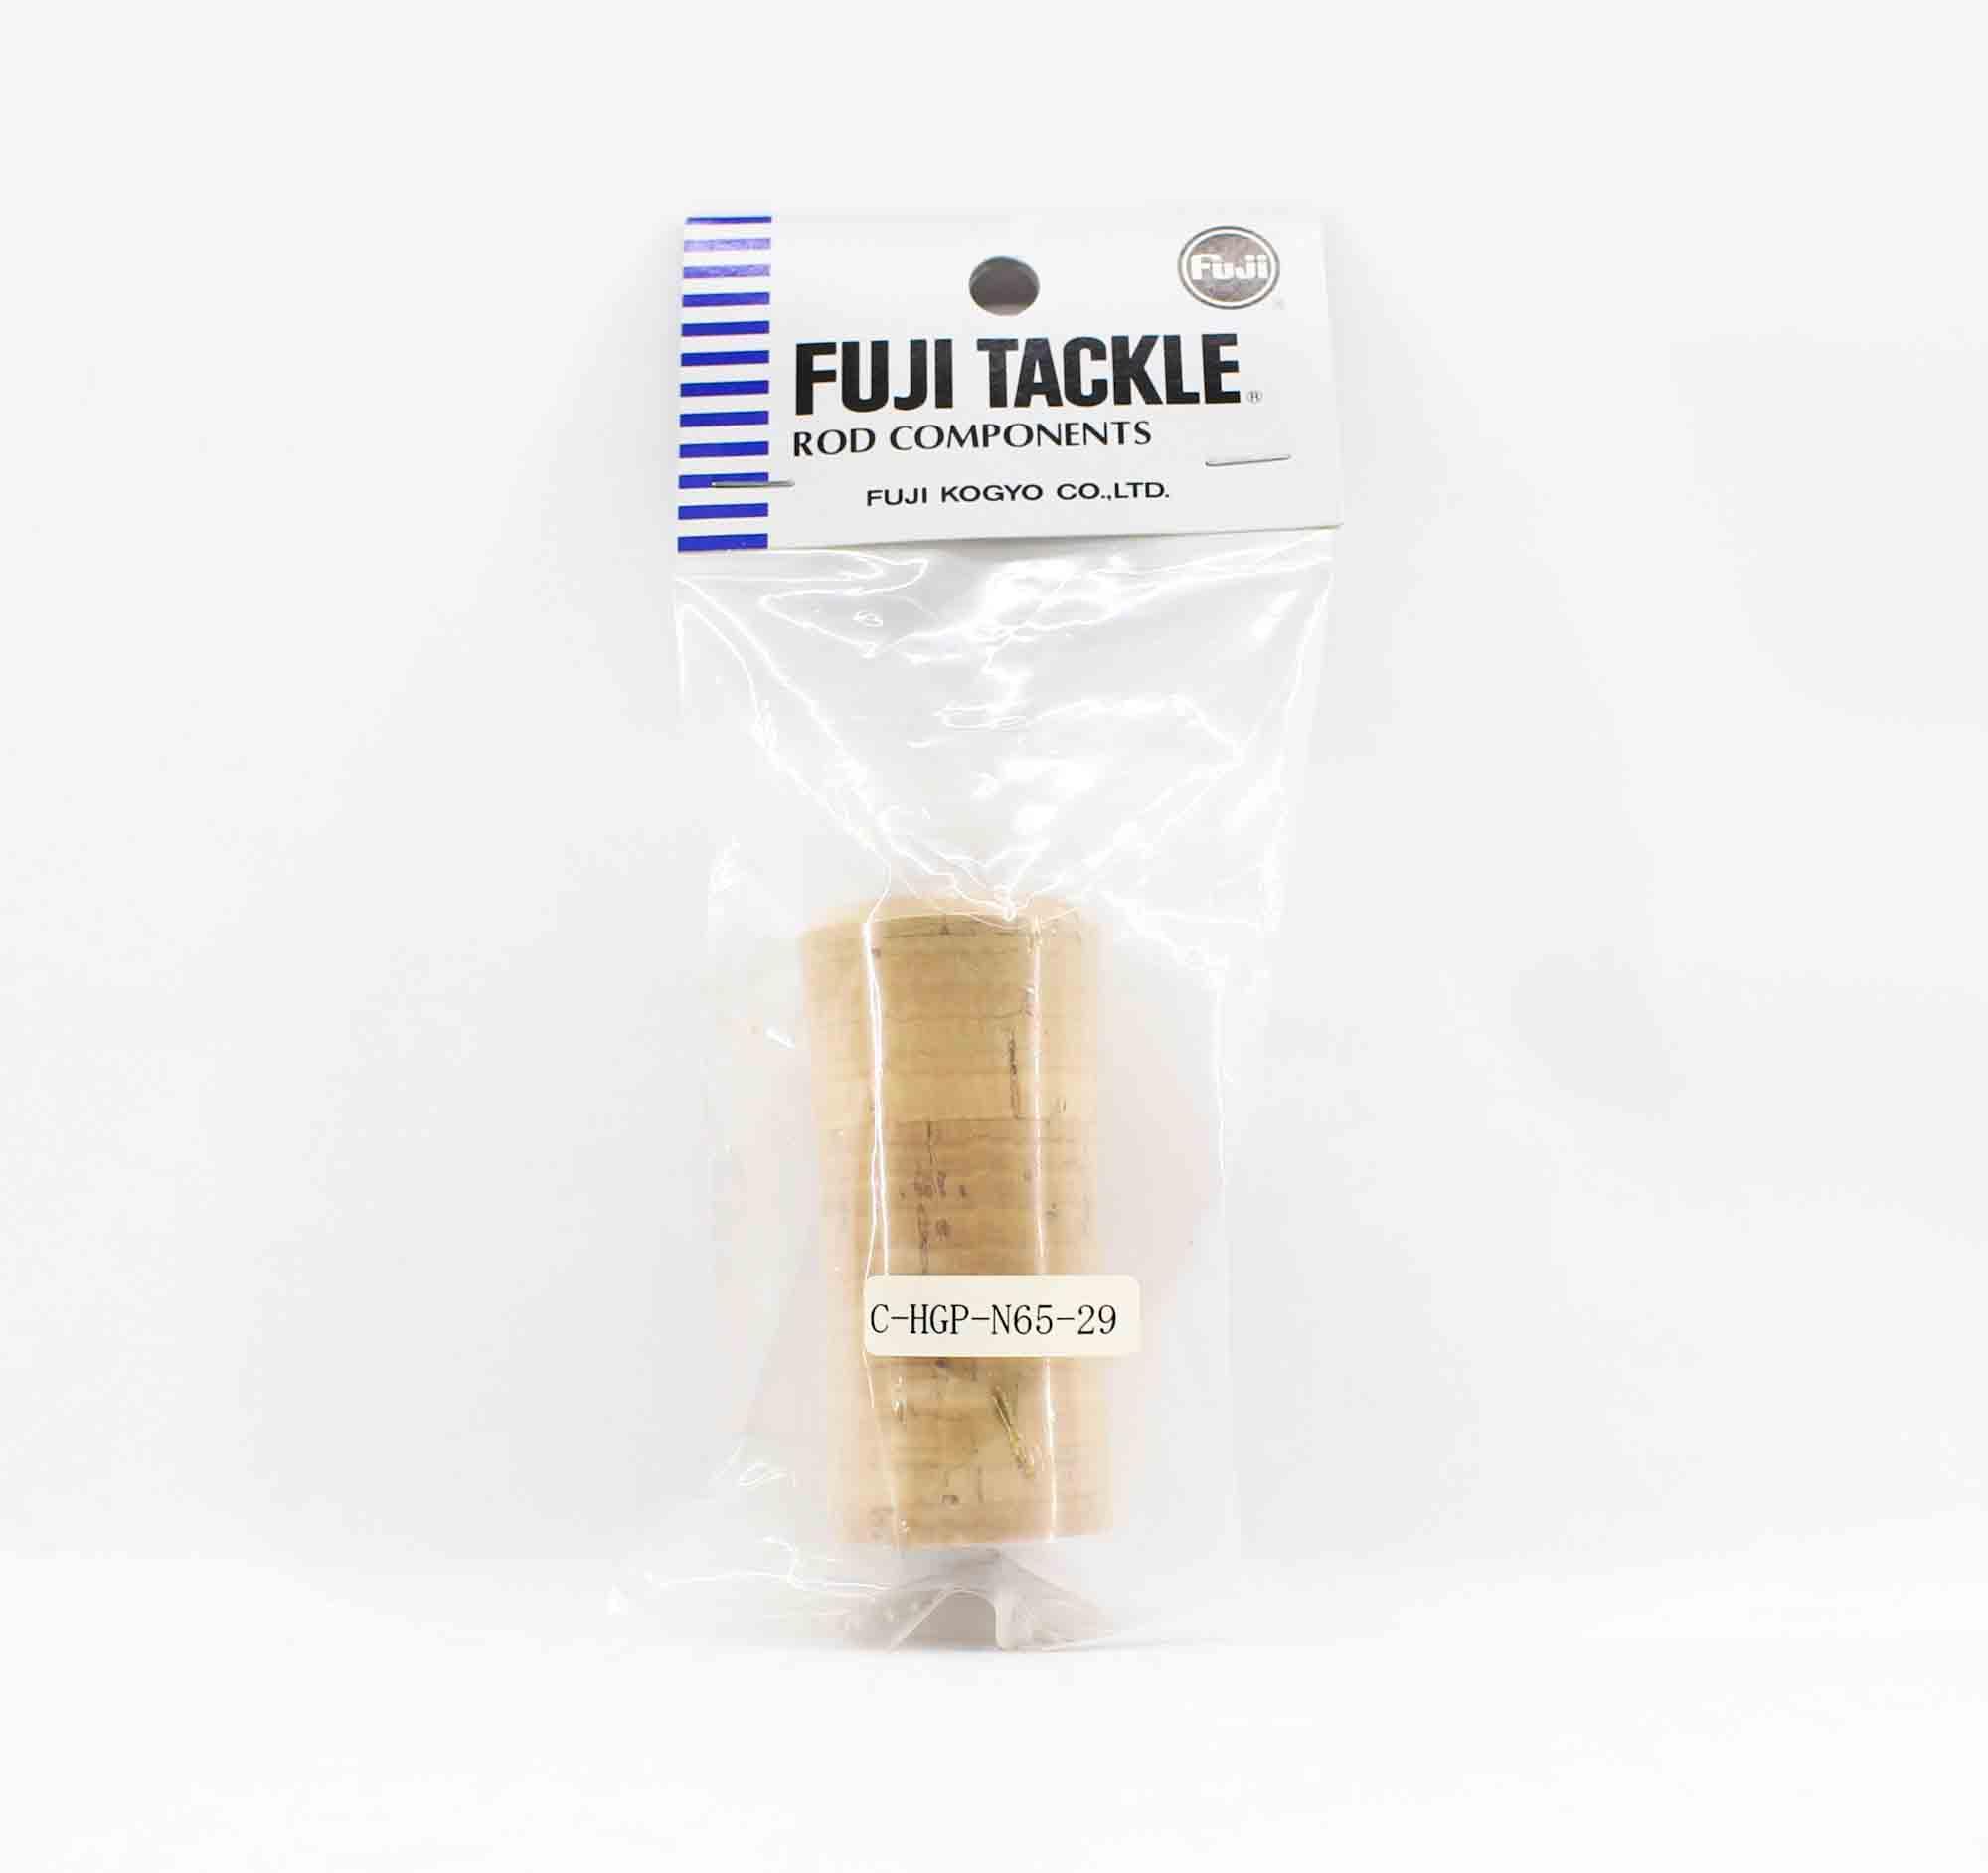 Fuji C-HGPN Size 65-29 Cork Rod Handle (9189)